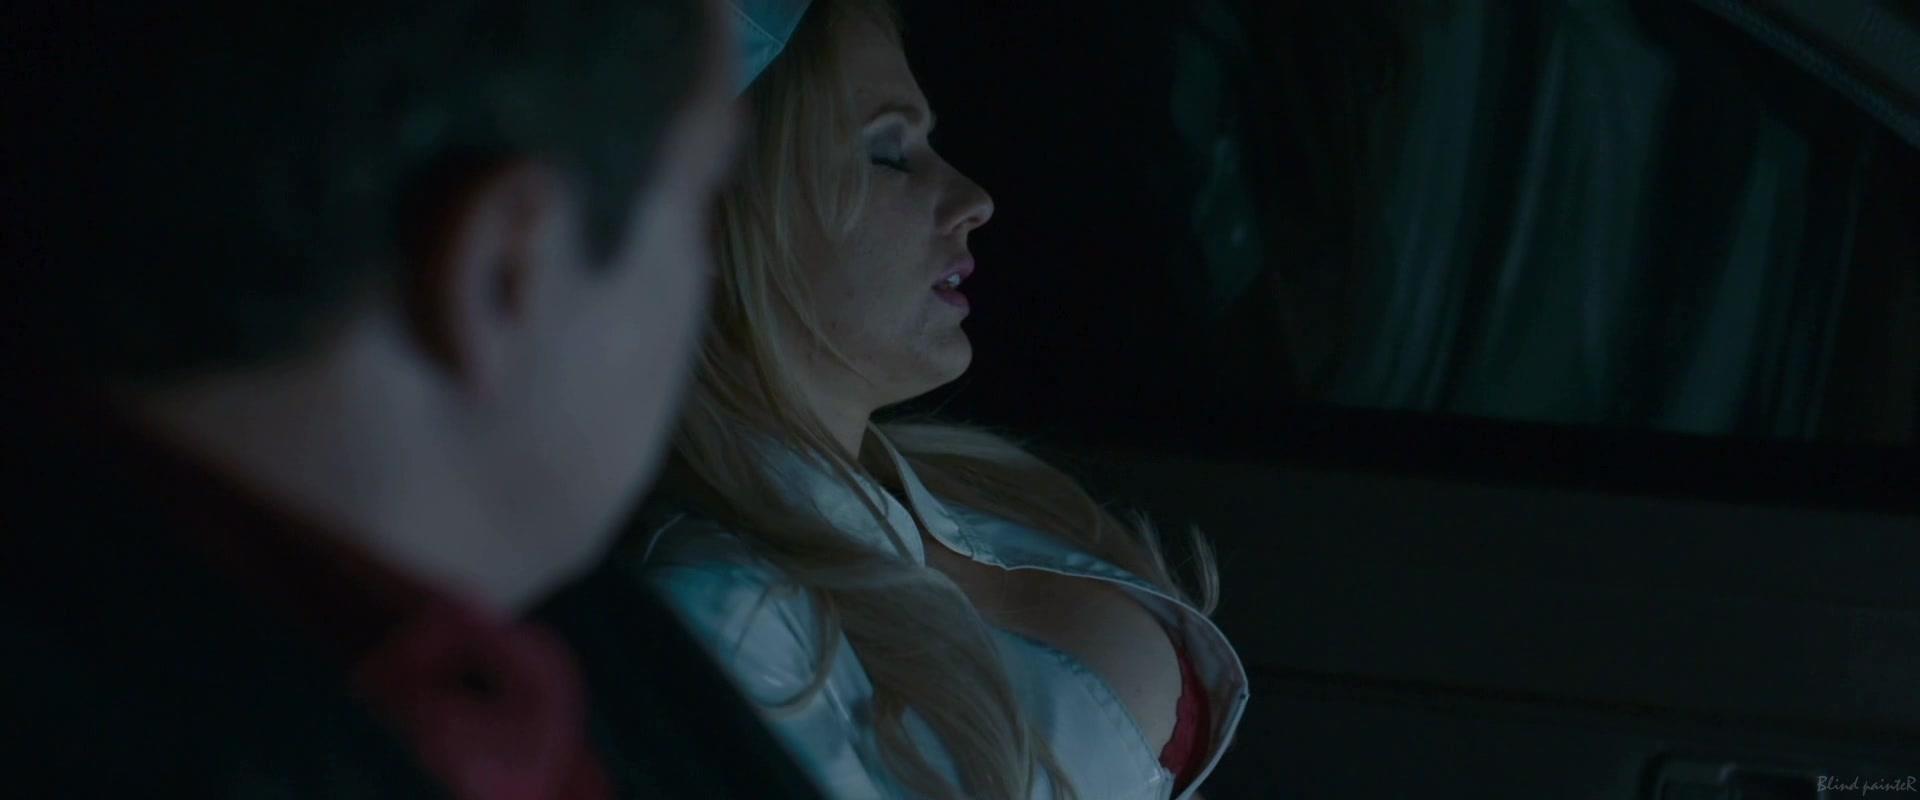 Melissa joan hart naked real